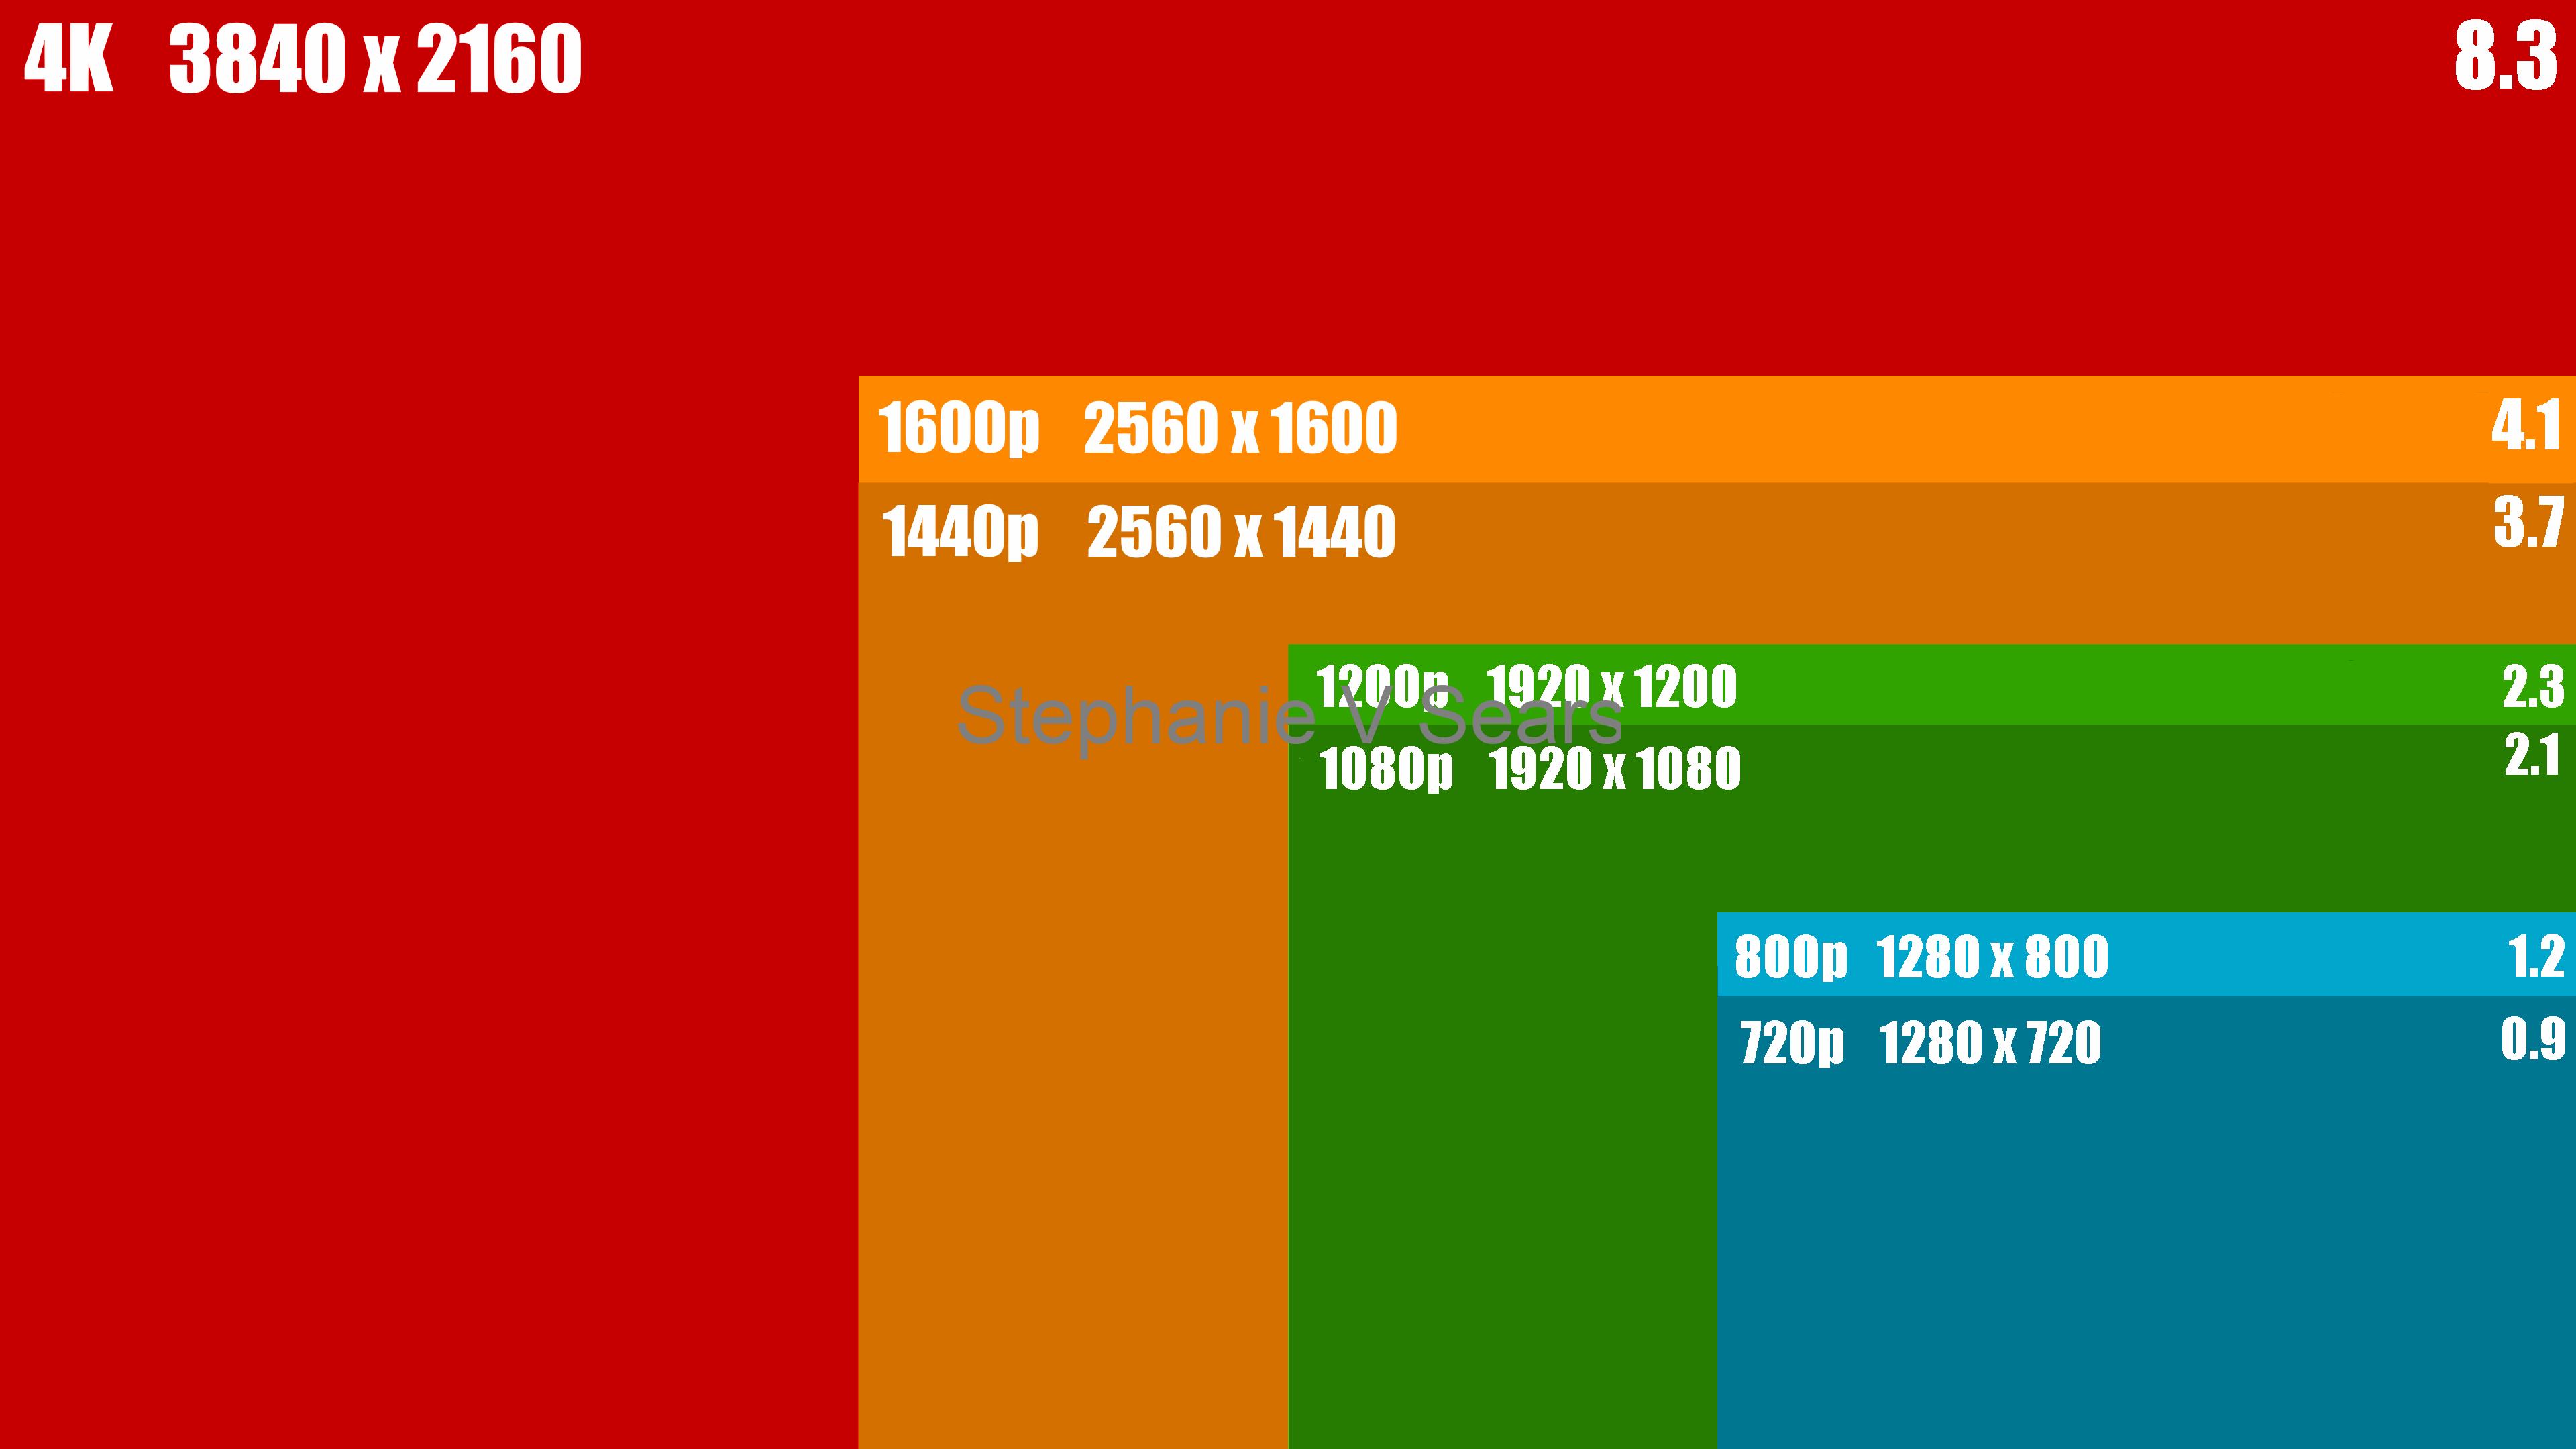 1_common-hd-resolutions-compared